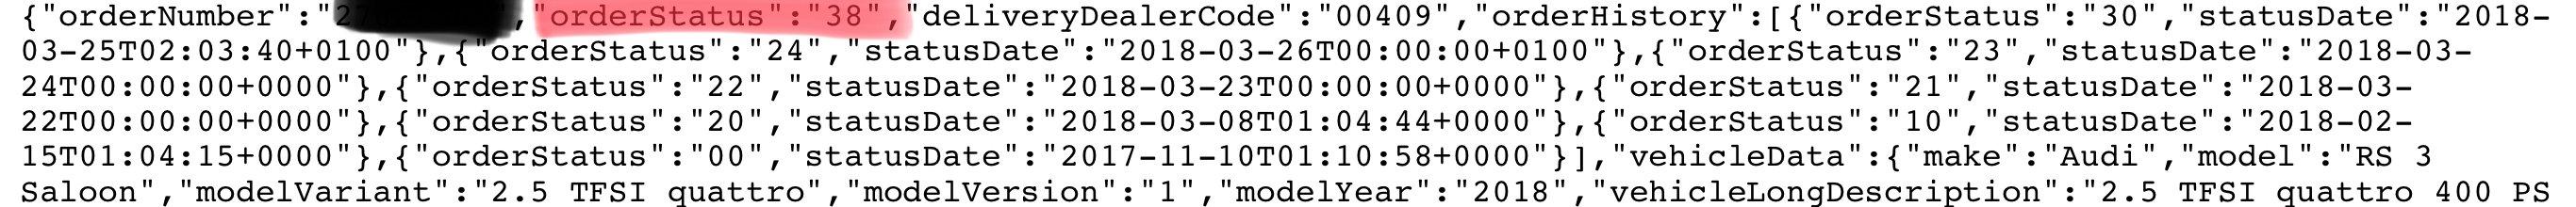 C519D8FE-B5CF-45E7-9255-76007B502659.jpeg